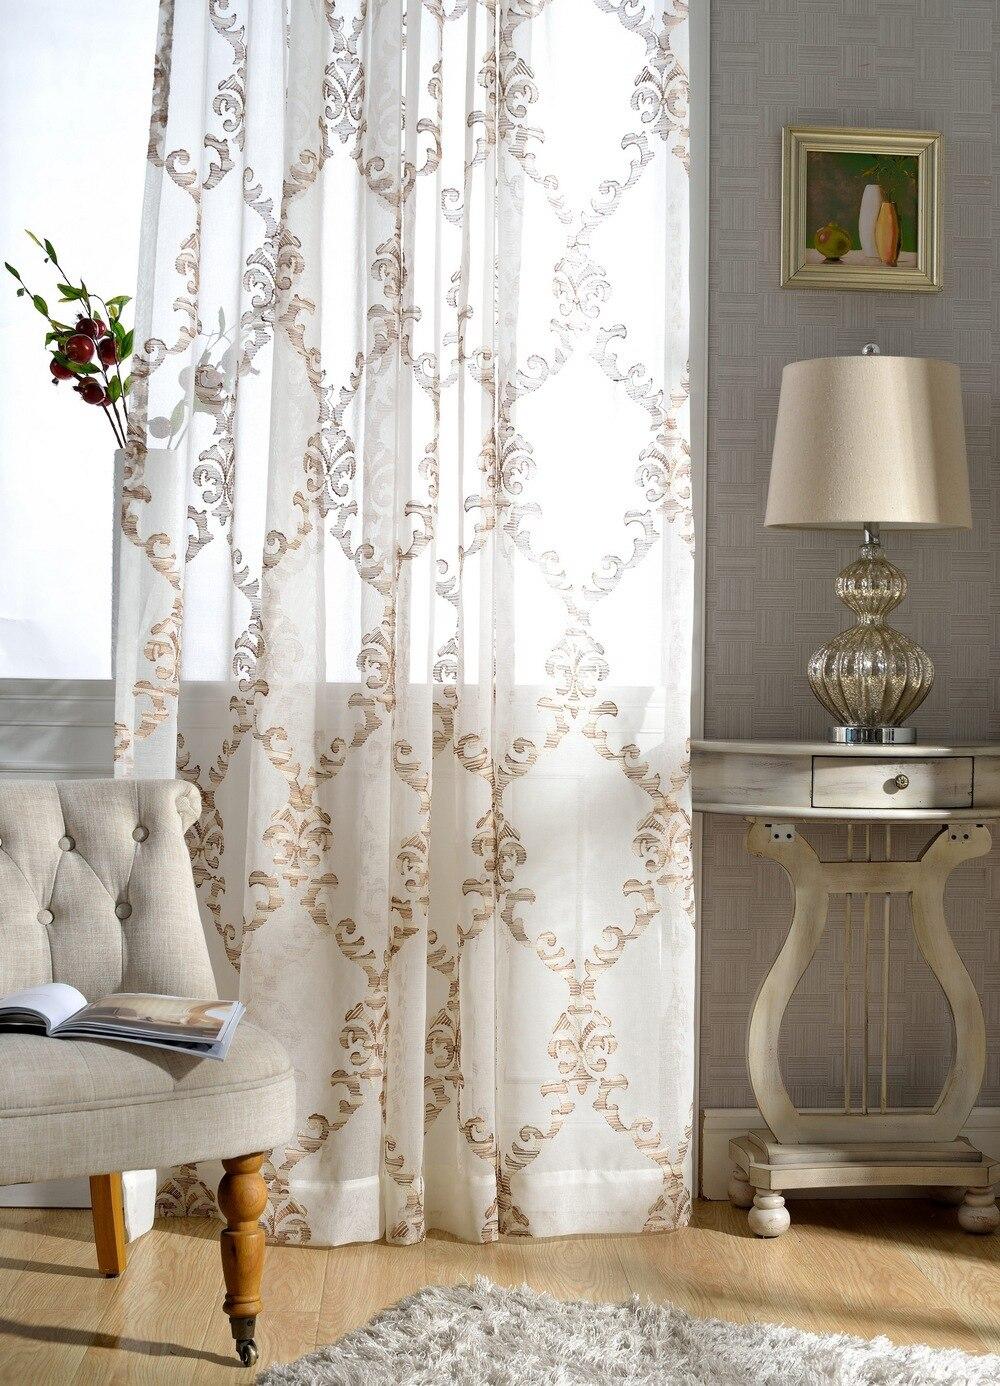 Awesome Tende Soggiorno Ikea Images - Design and Ideas ...